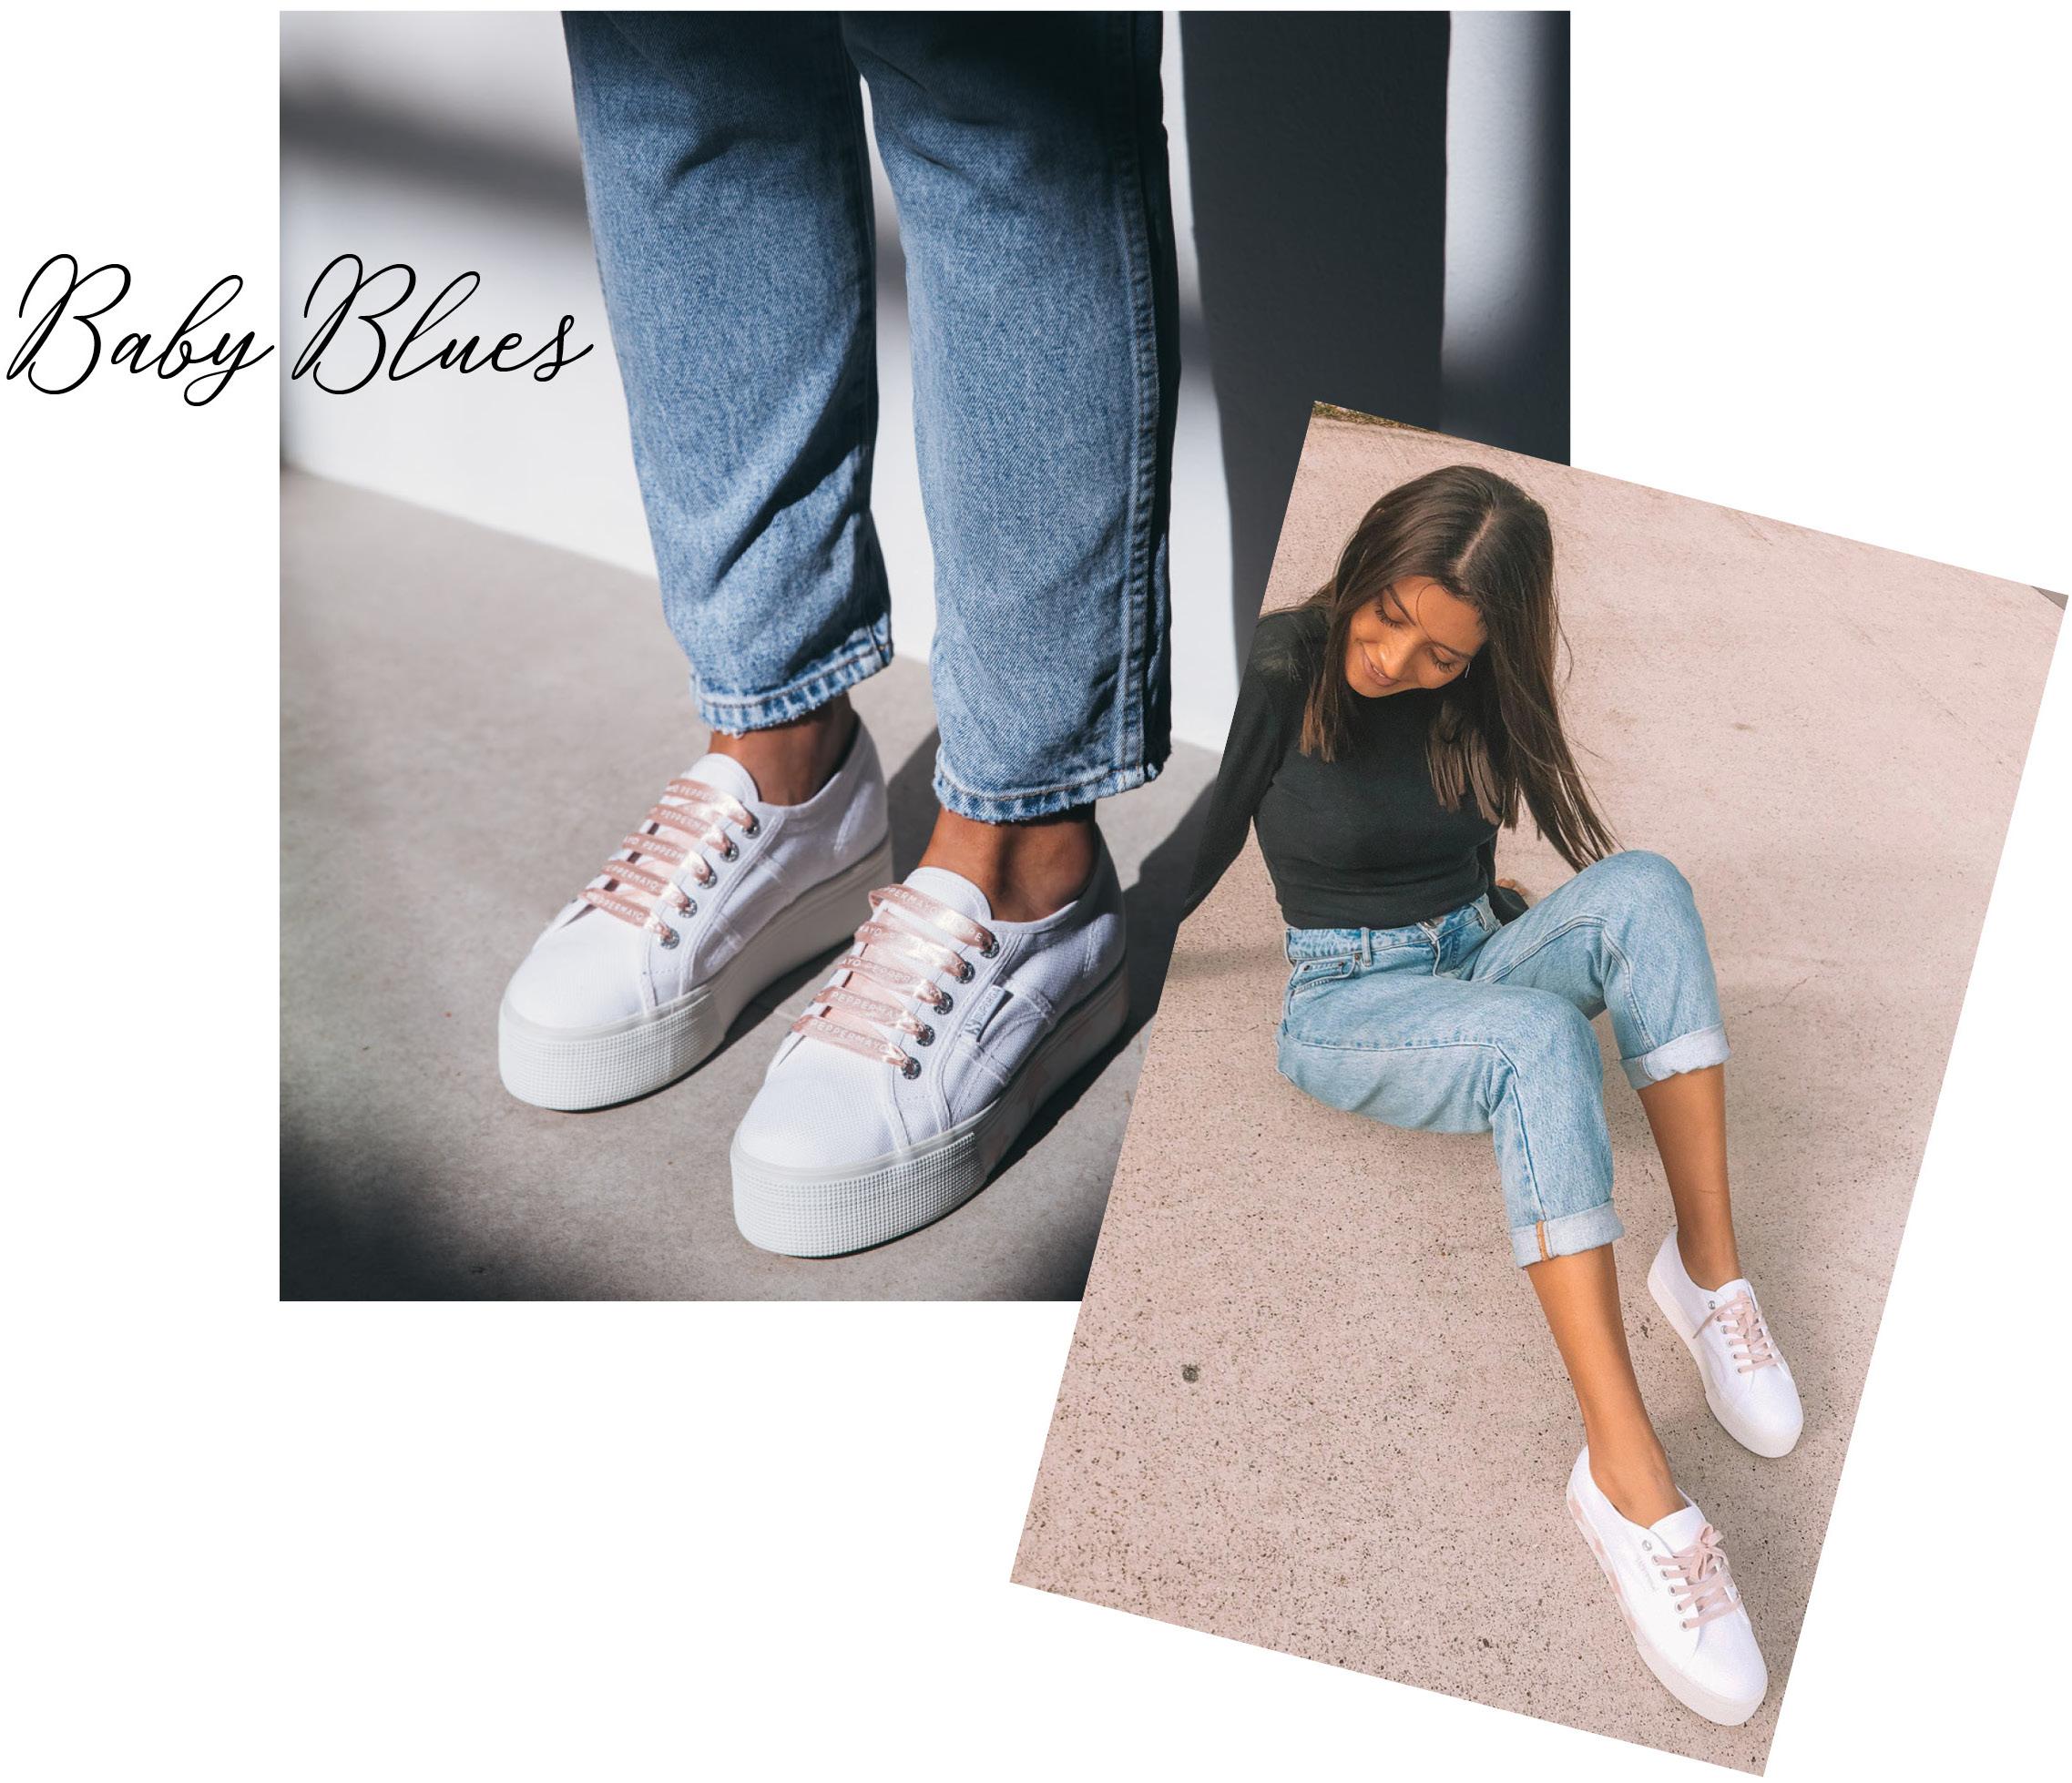 Superga Styling - Jeans.jpg